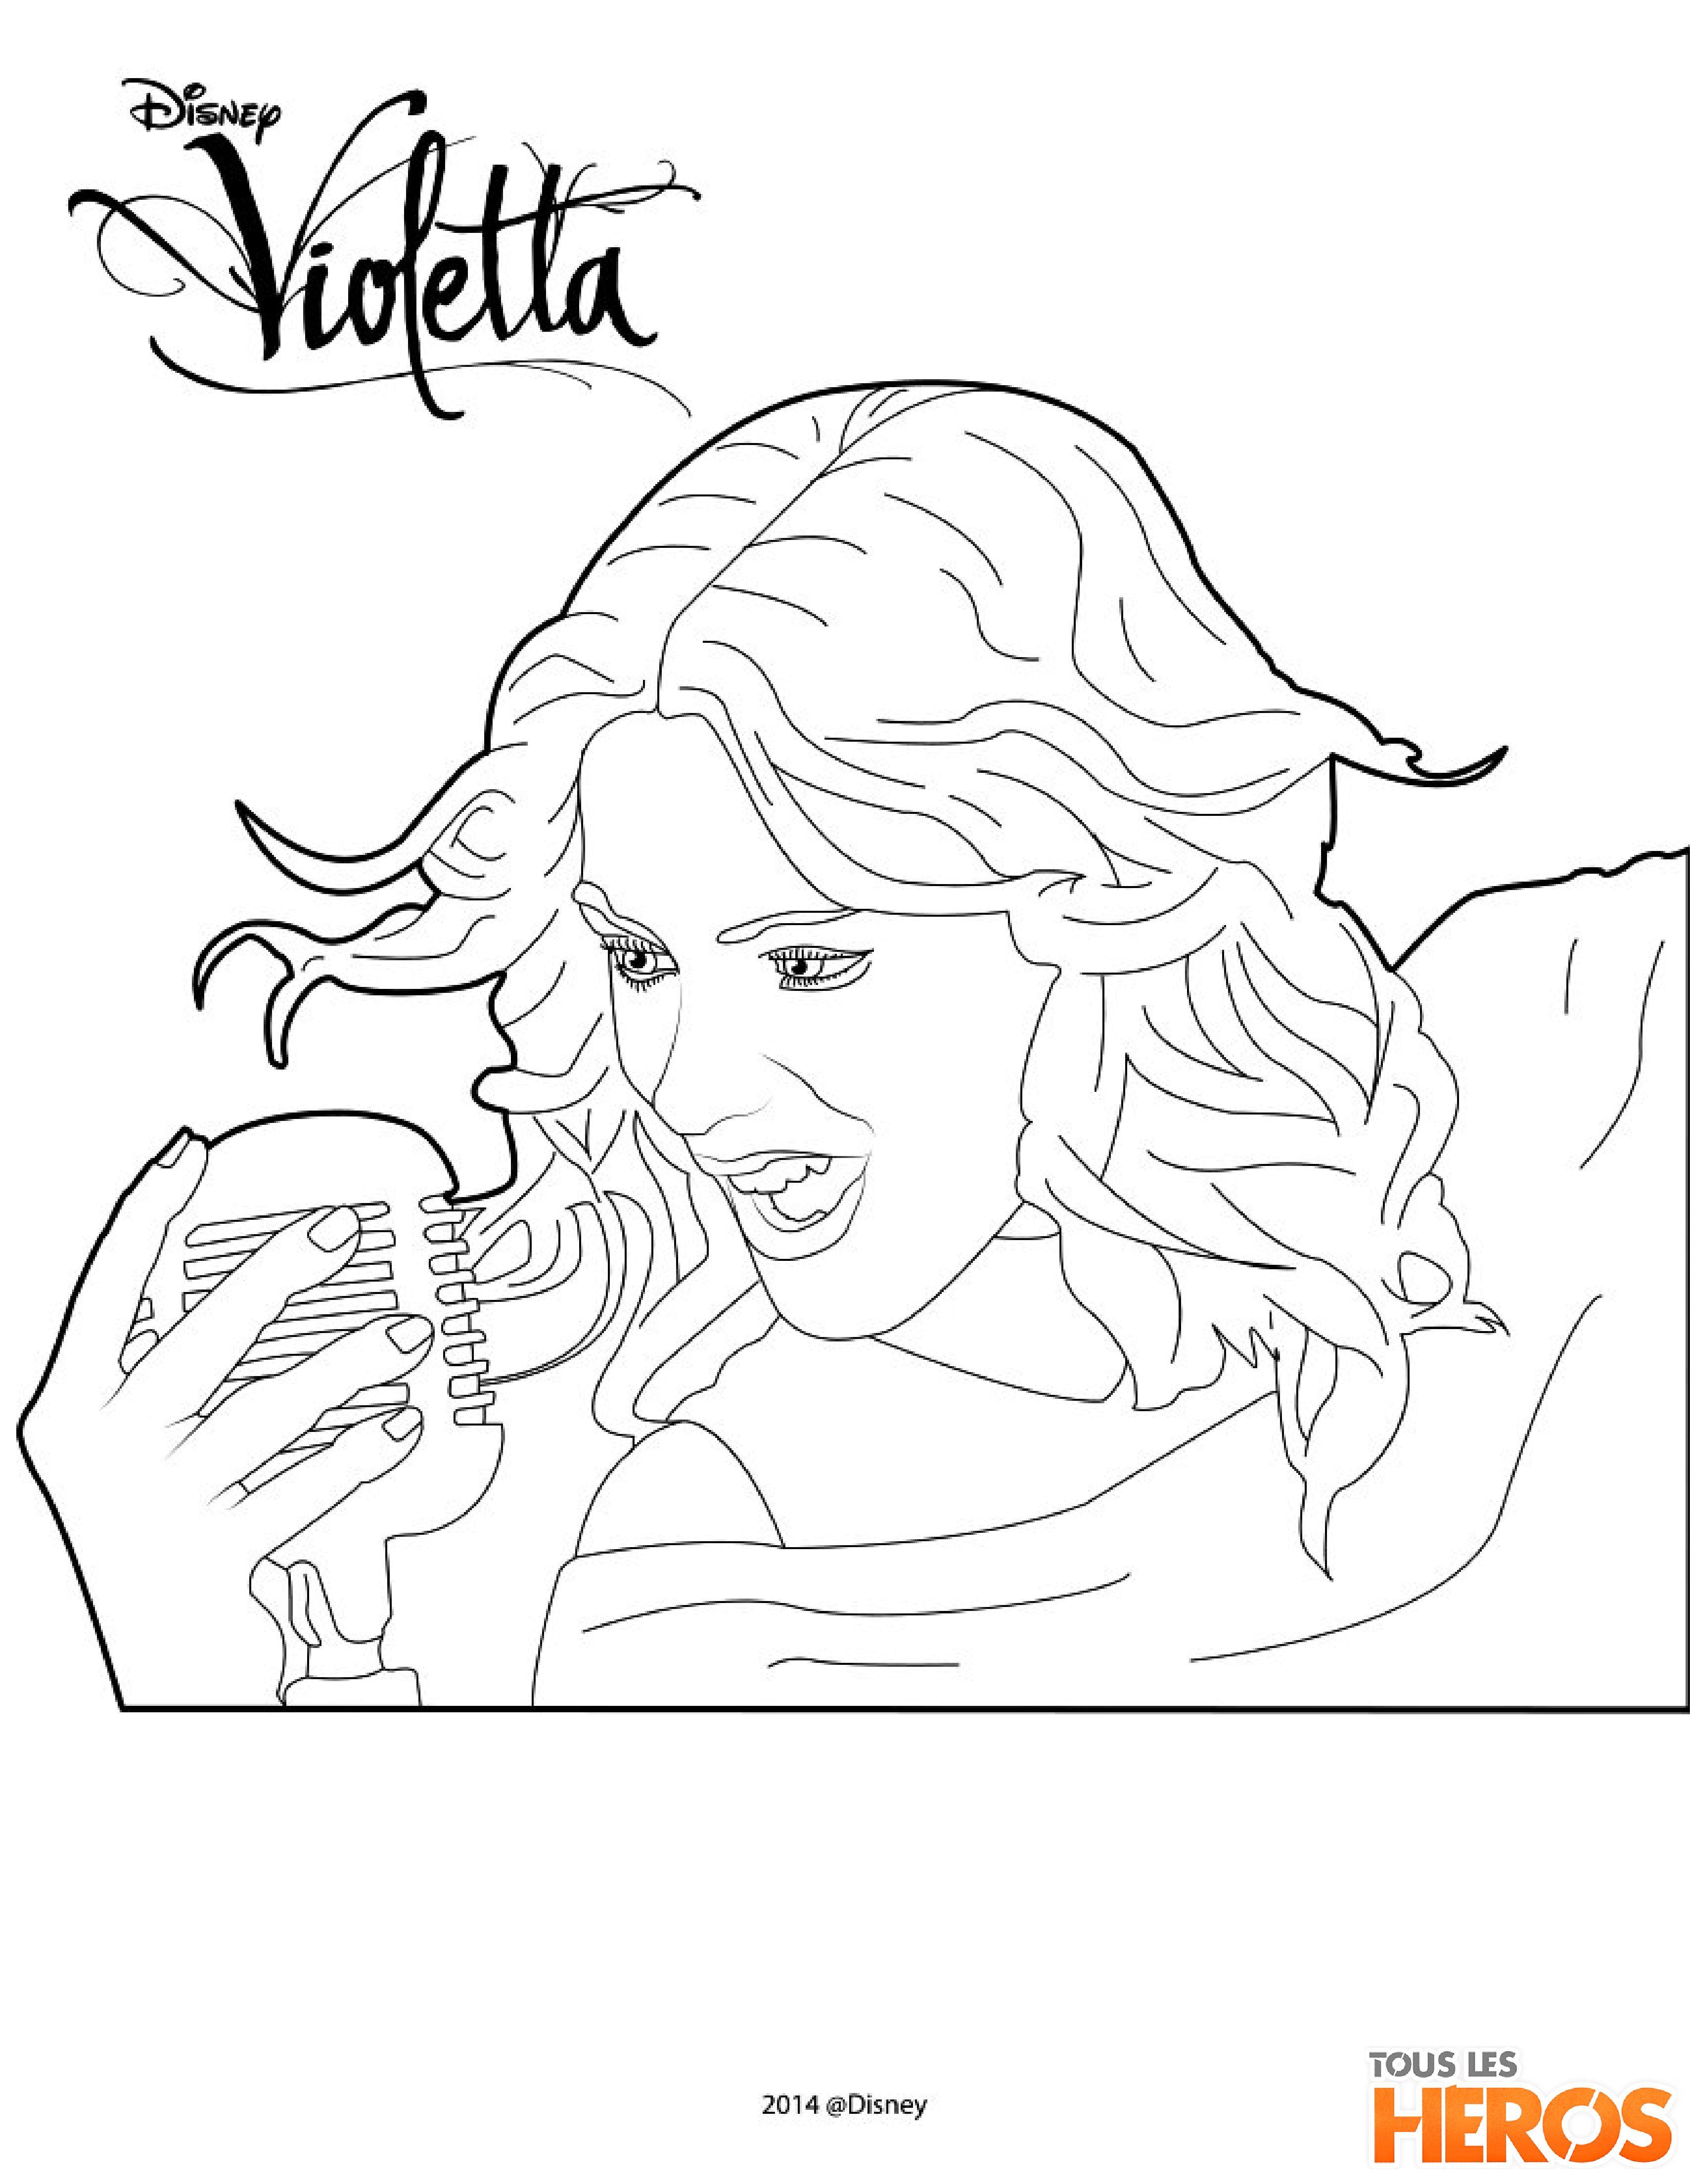 Violetta11 Jpg 3417 4417 Maleboger